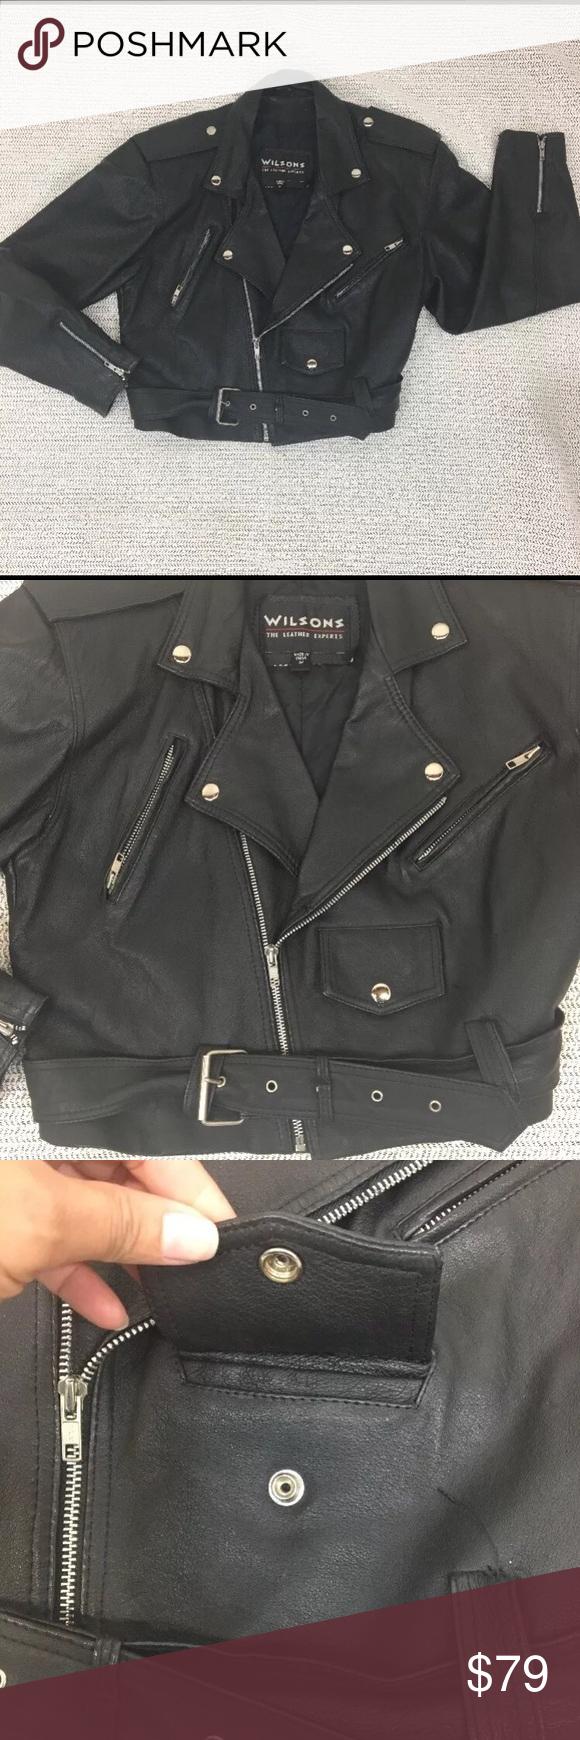 d00d298f0 Vintage Wilson's Leather Motorcycle Jacket M Women's Vintage ...